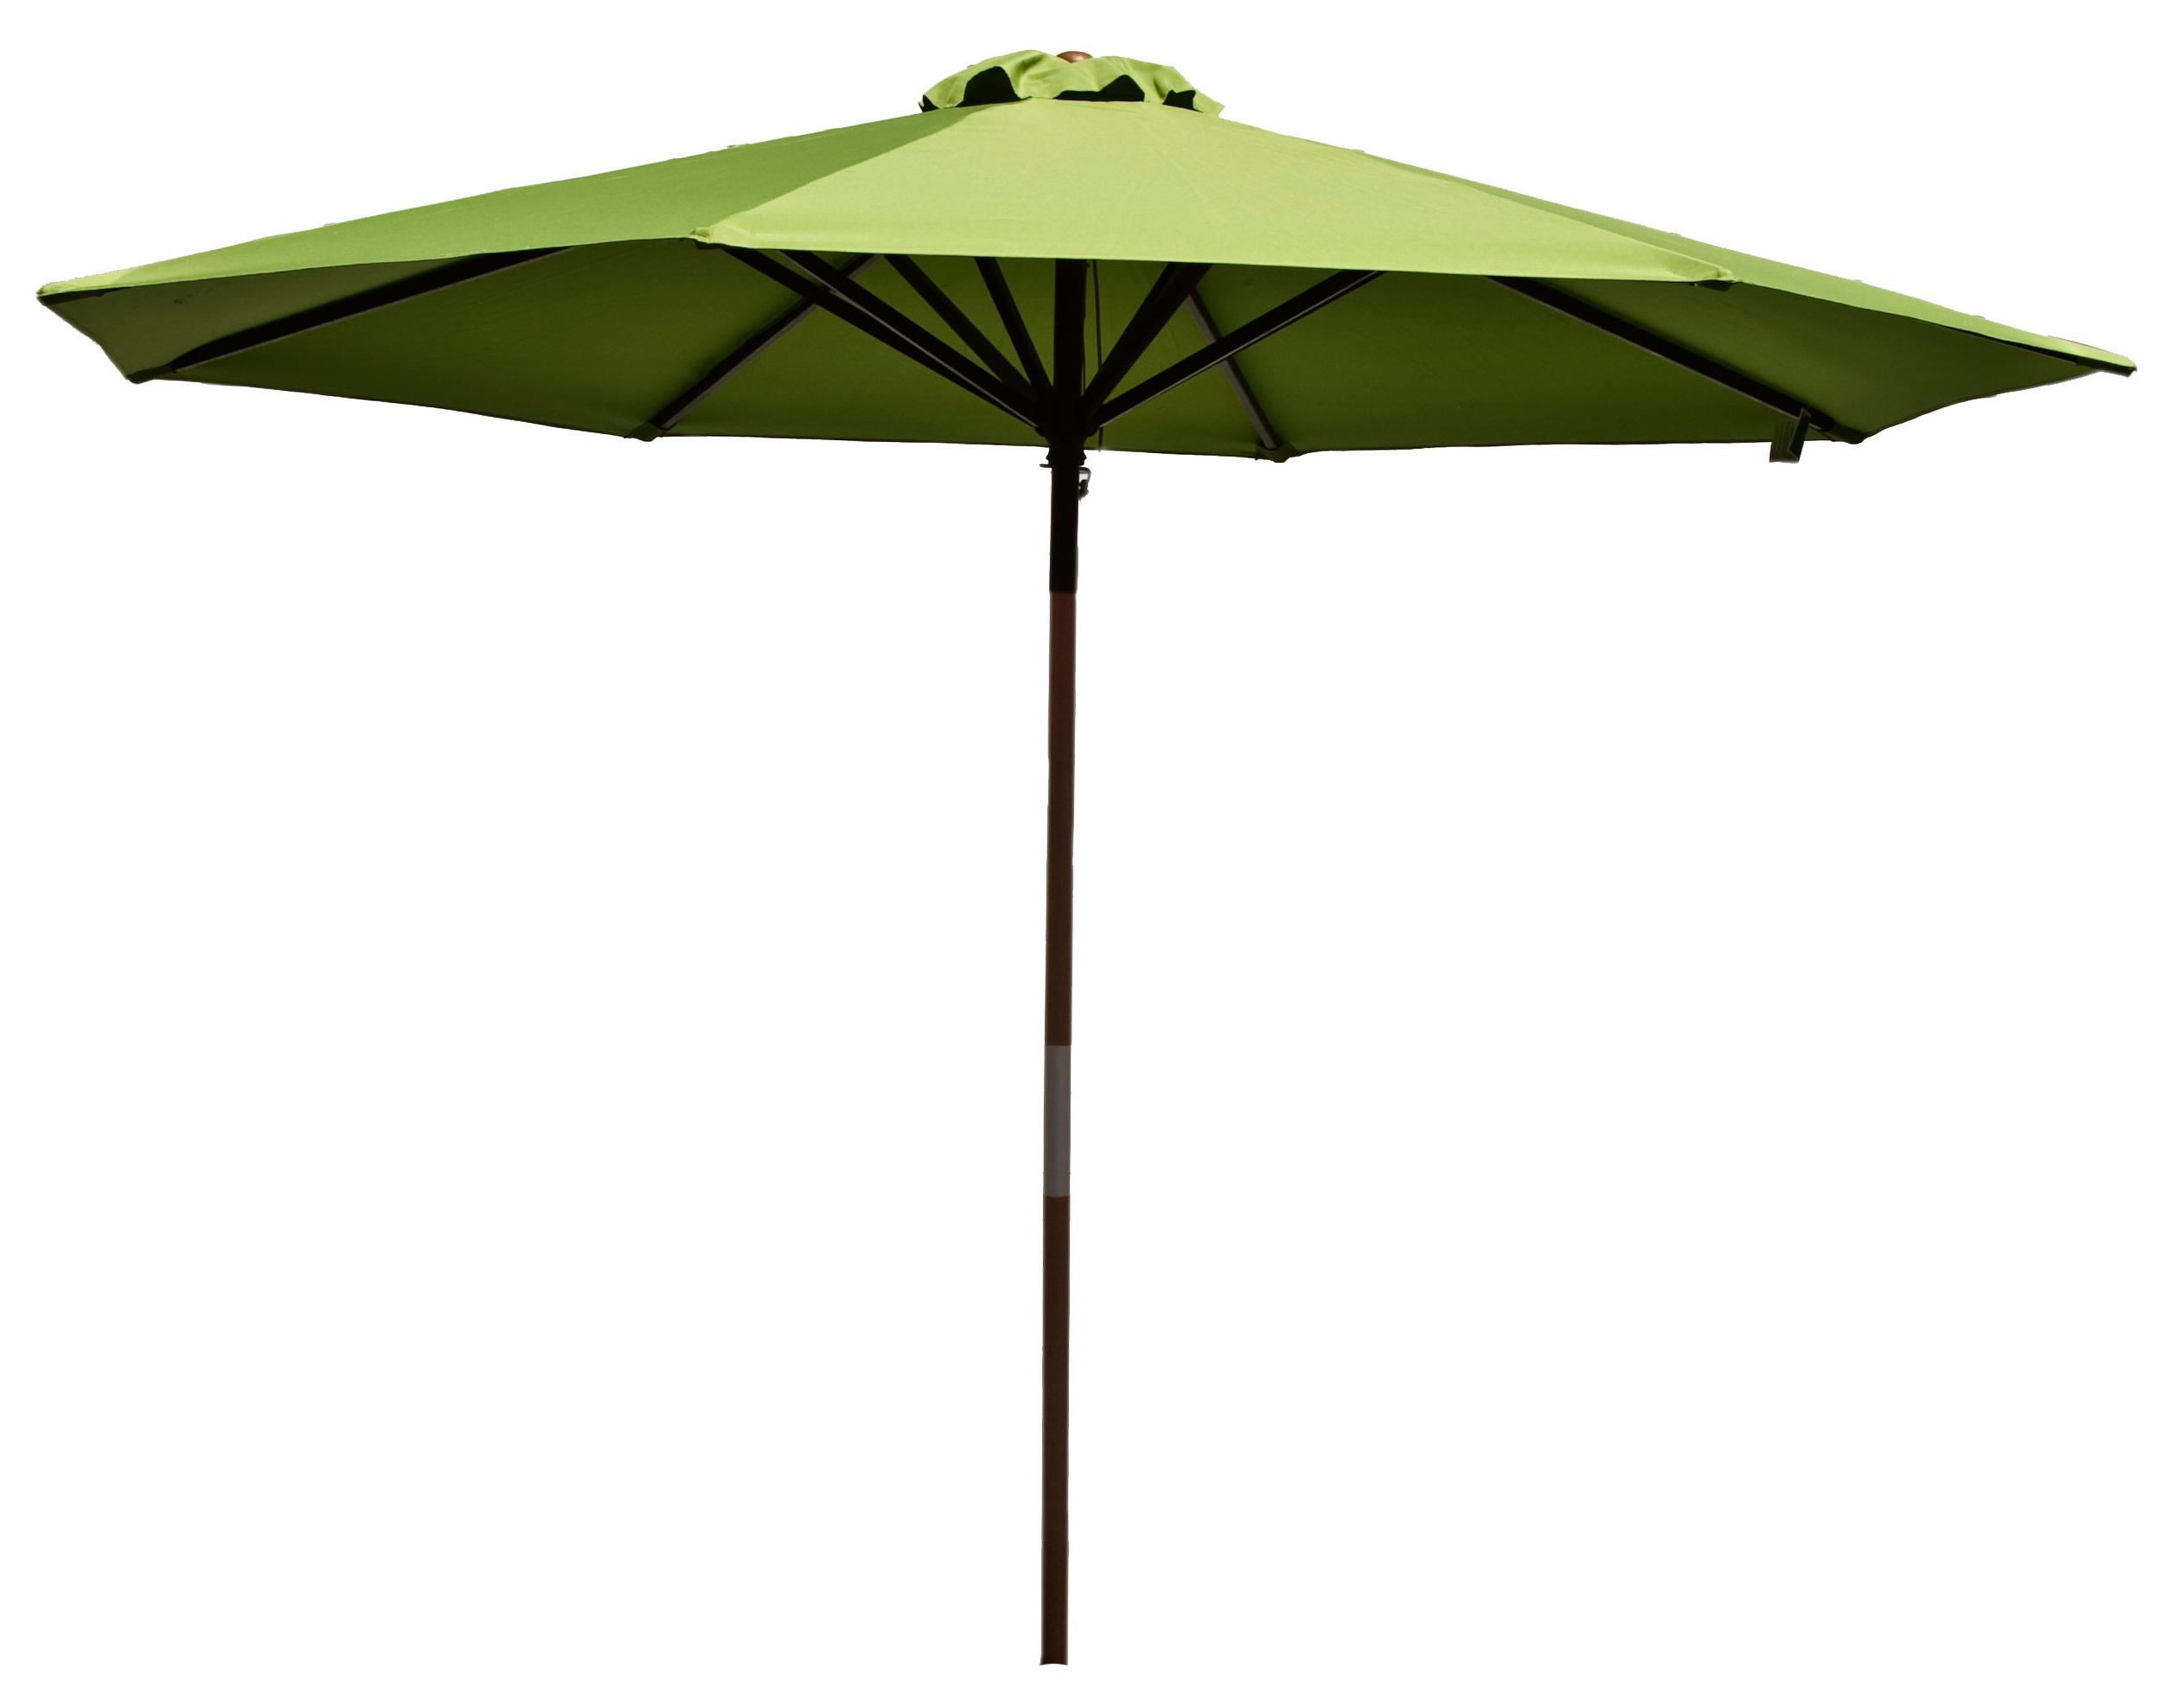 9' Market Umbrella Throughout Fashionable Aldan Market Umbrellas (View 2 of 20)